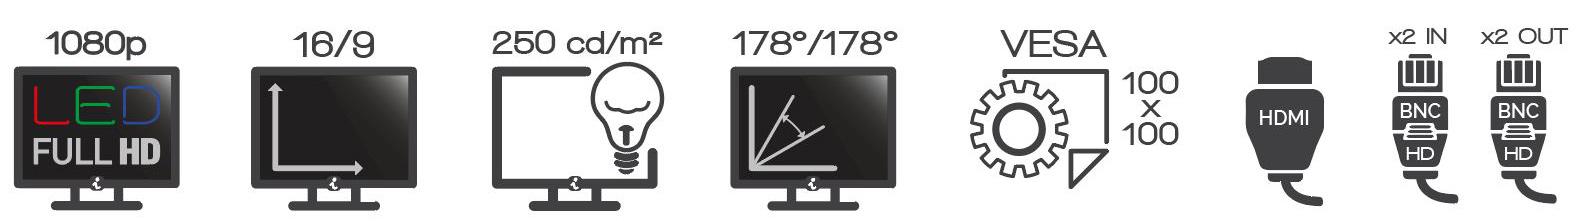 Connectiques V22 HD